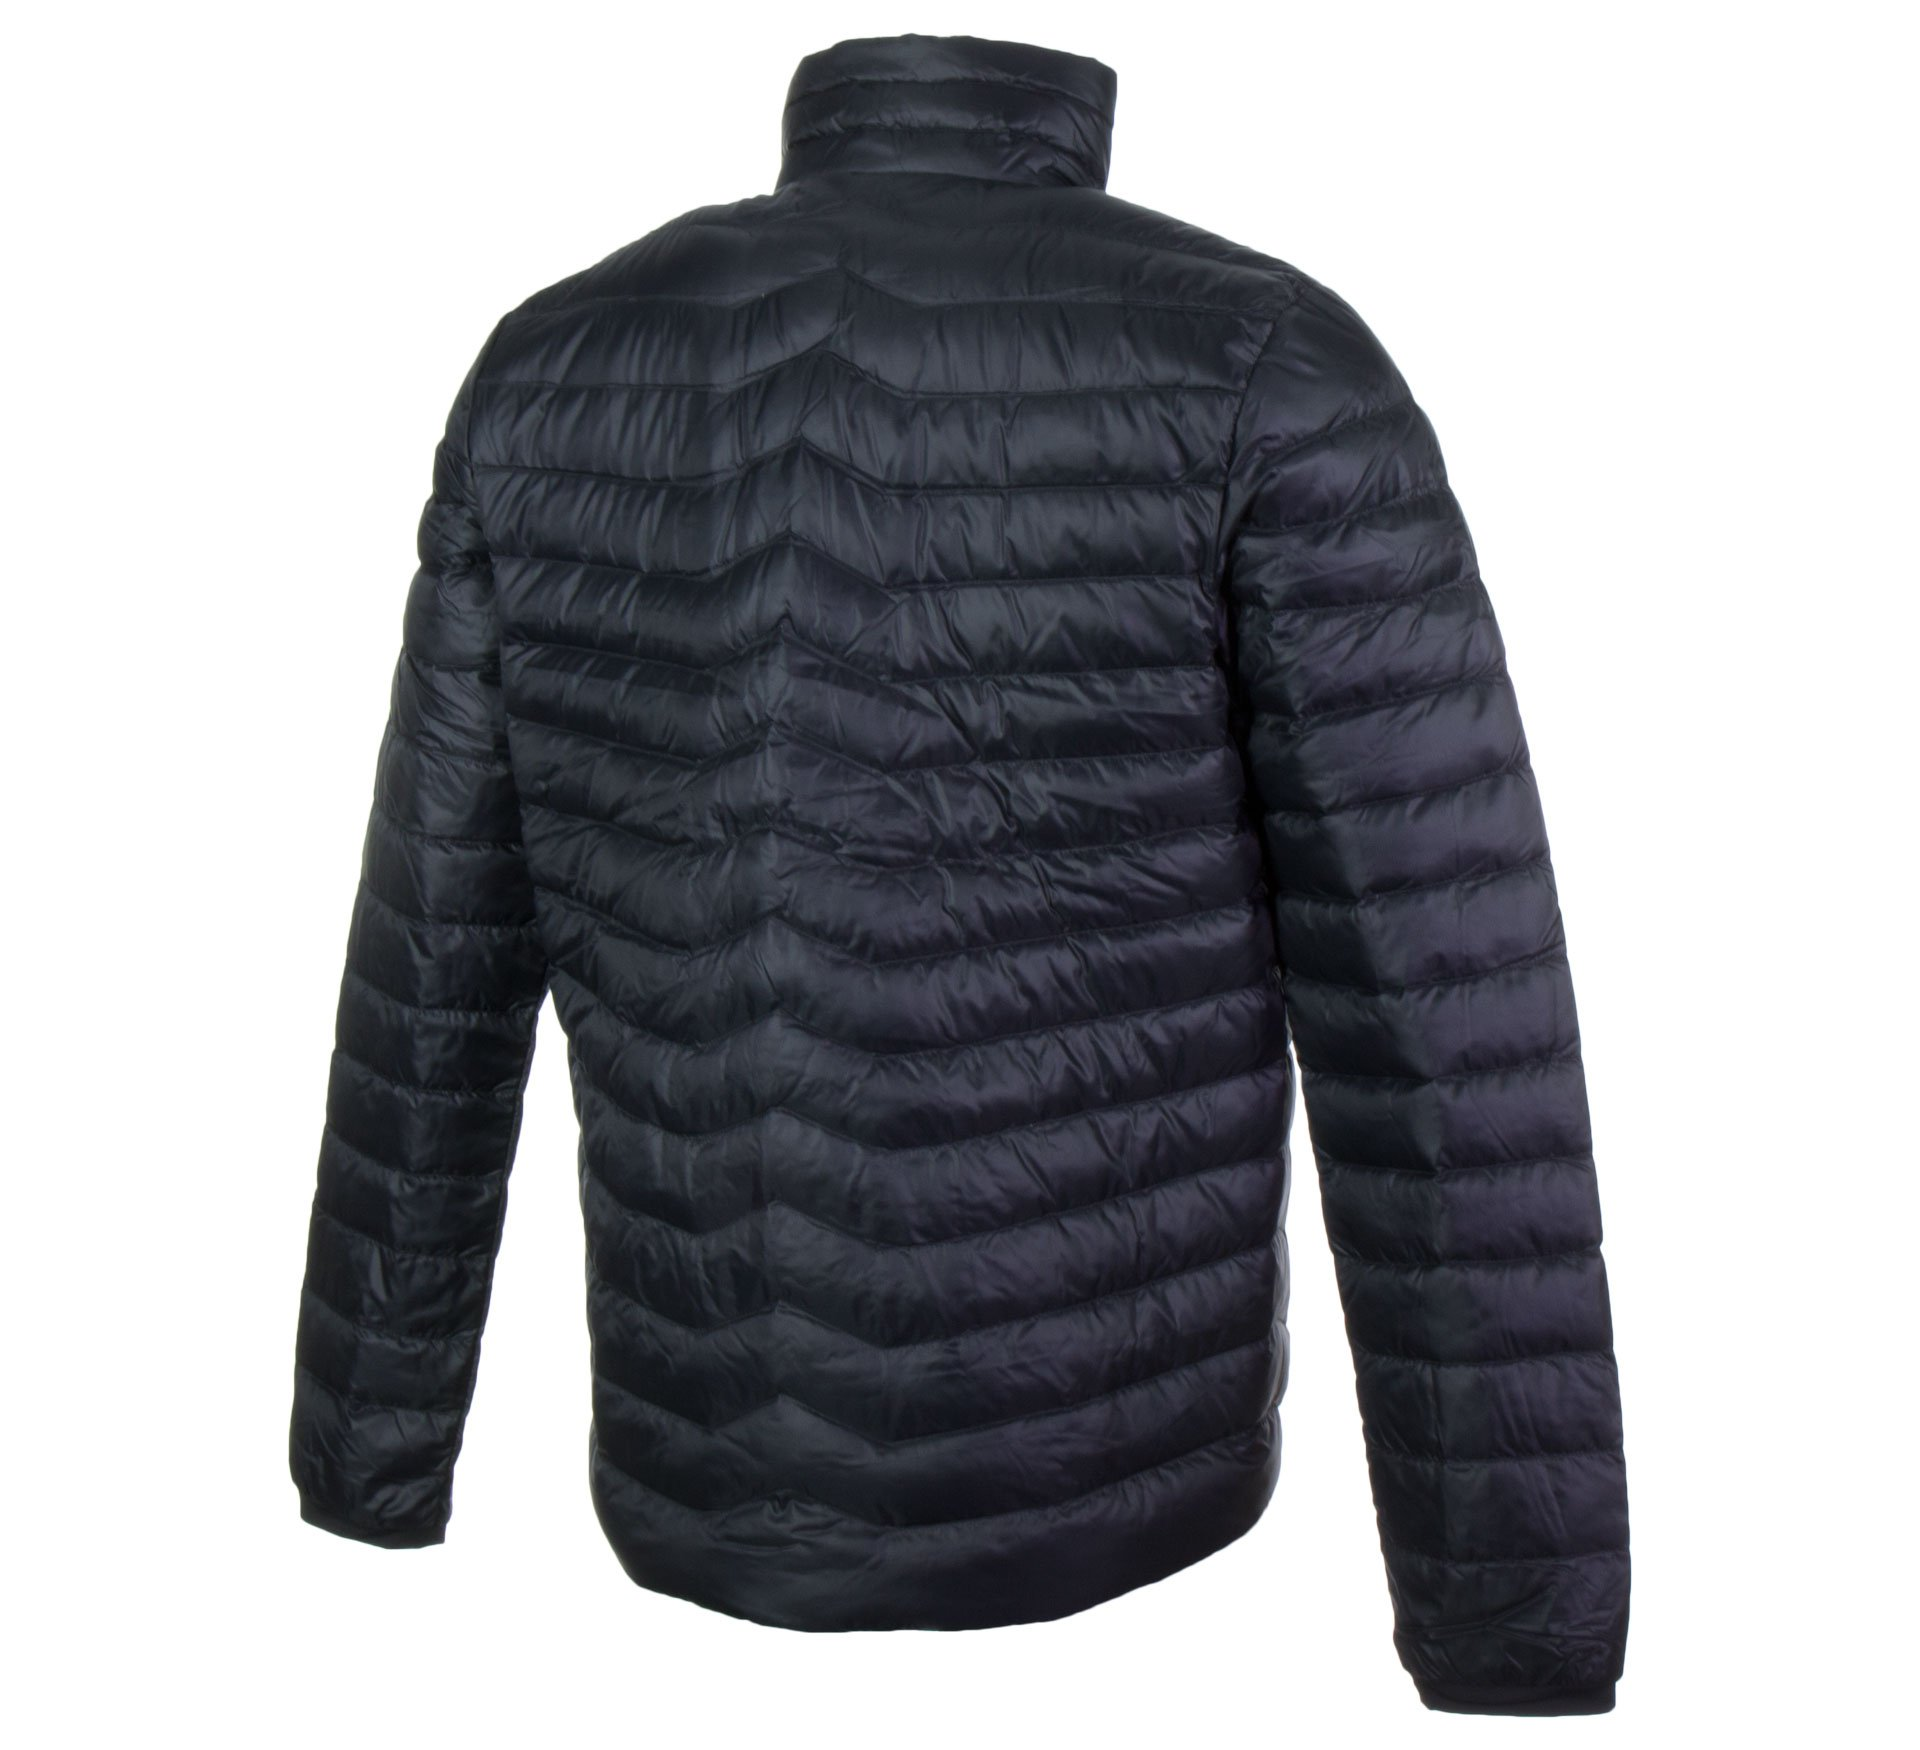 71Os0UP1%2BAL - Helly Hansen Verglas men's down insulator jacket.